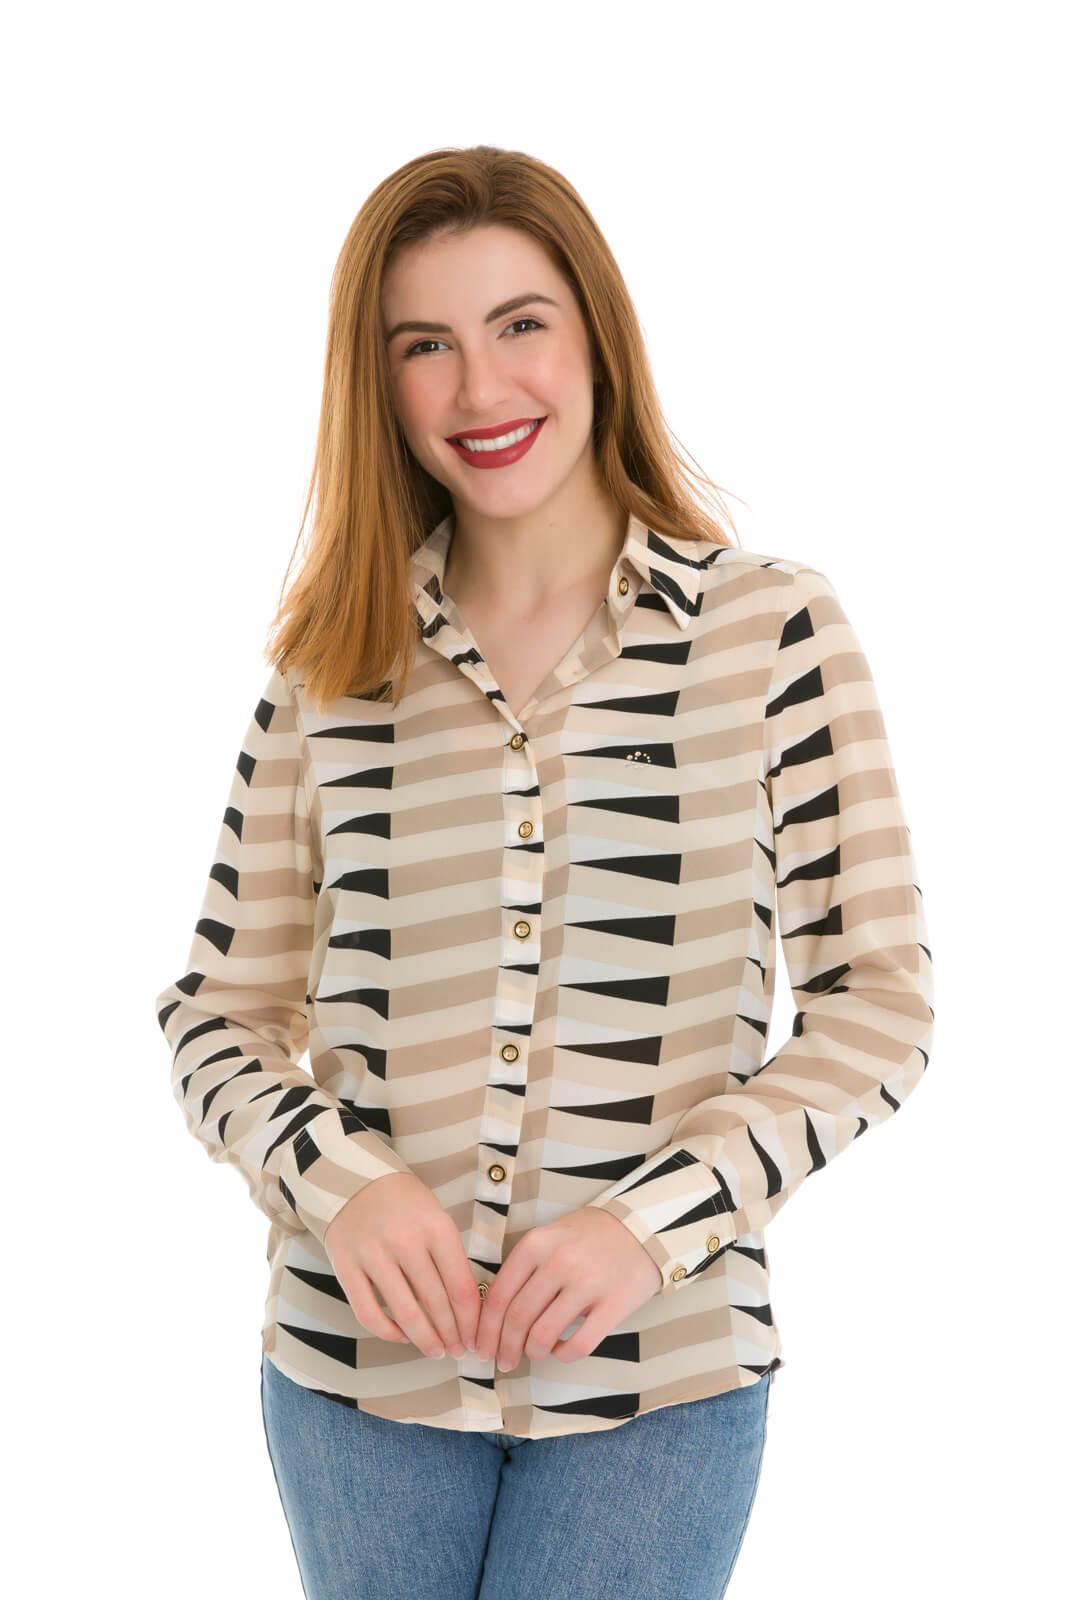 Camisa Camisete Feminino Olimpo Crepe Estampado Manga Longa Bege/Preto